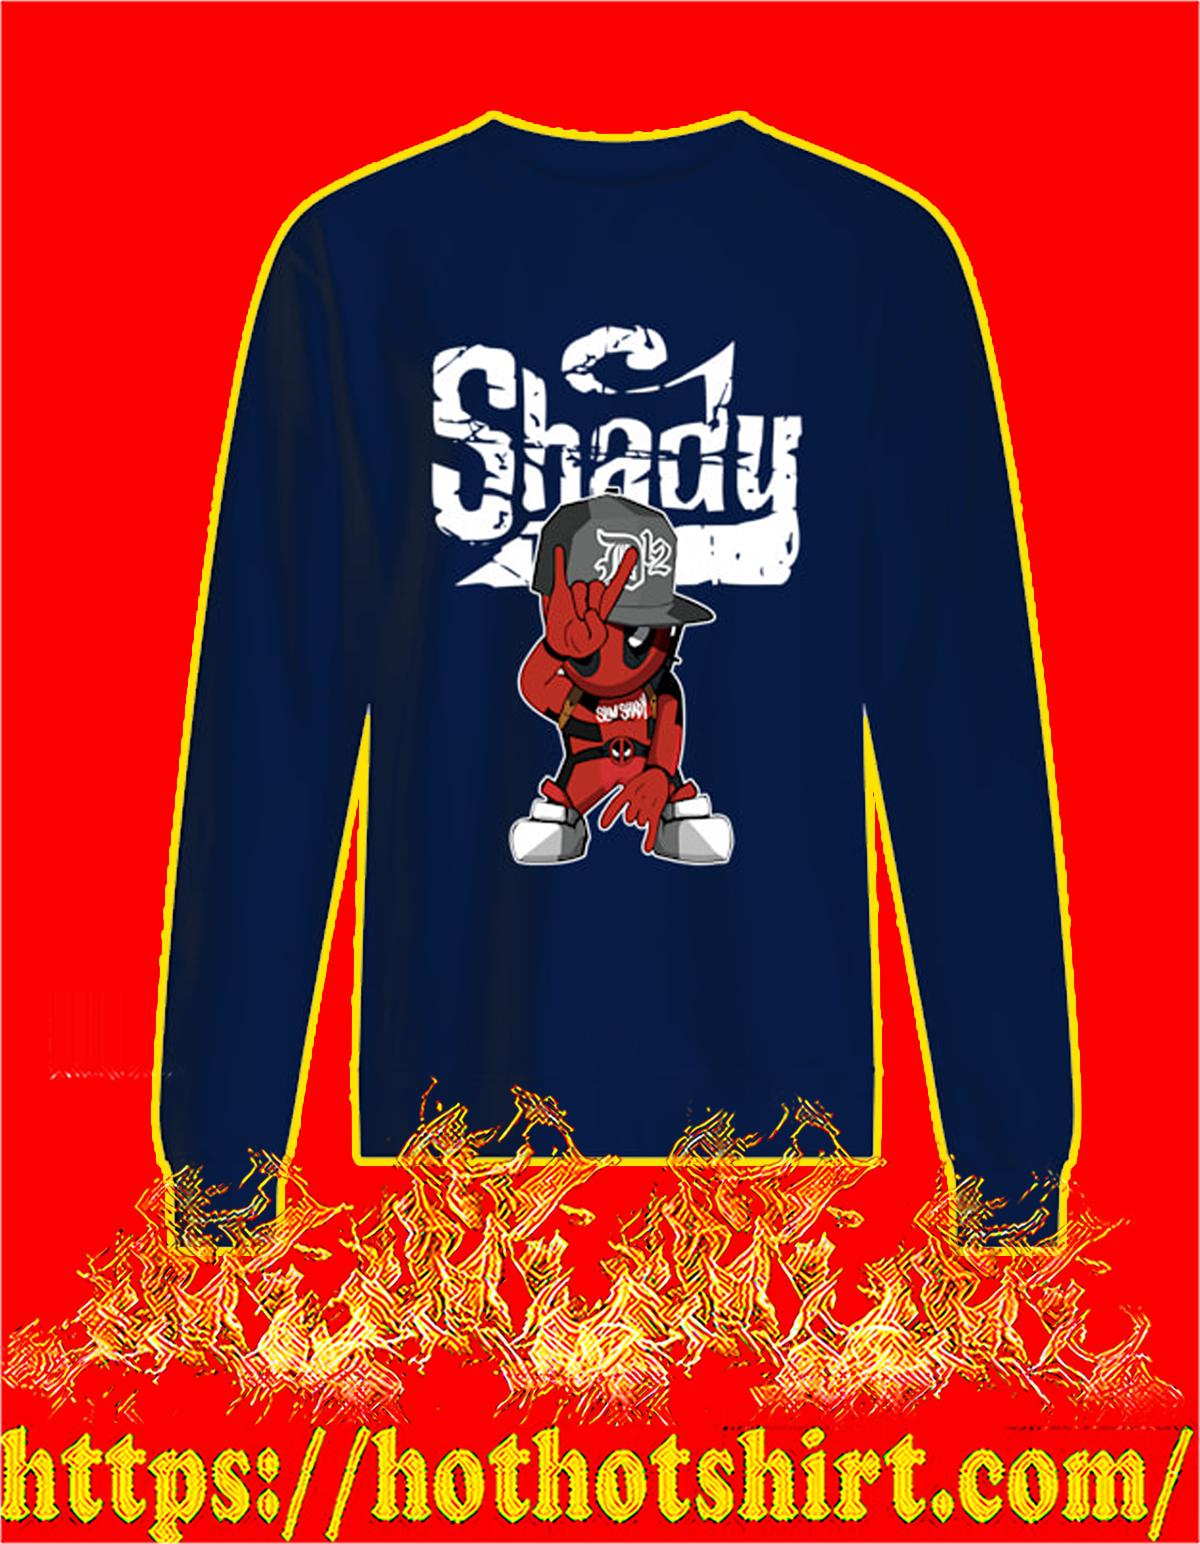 Slim shady D12 deadpool sweatshirt